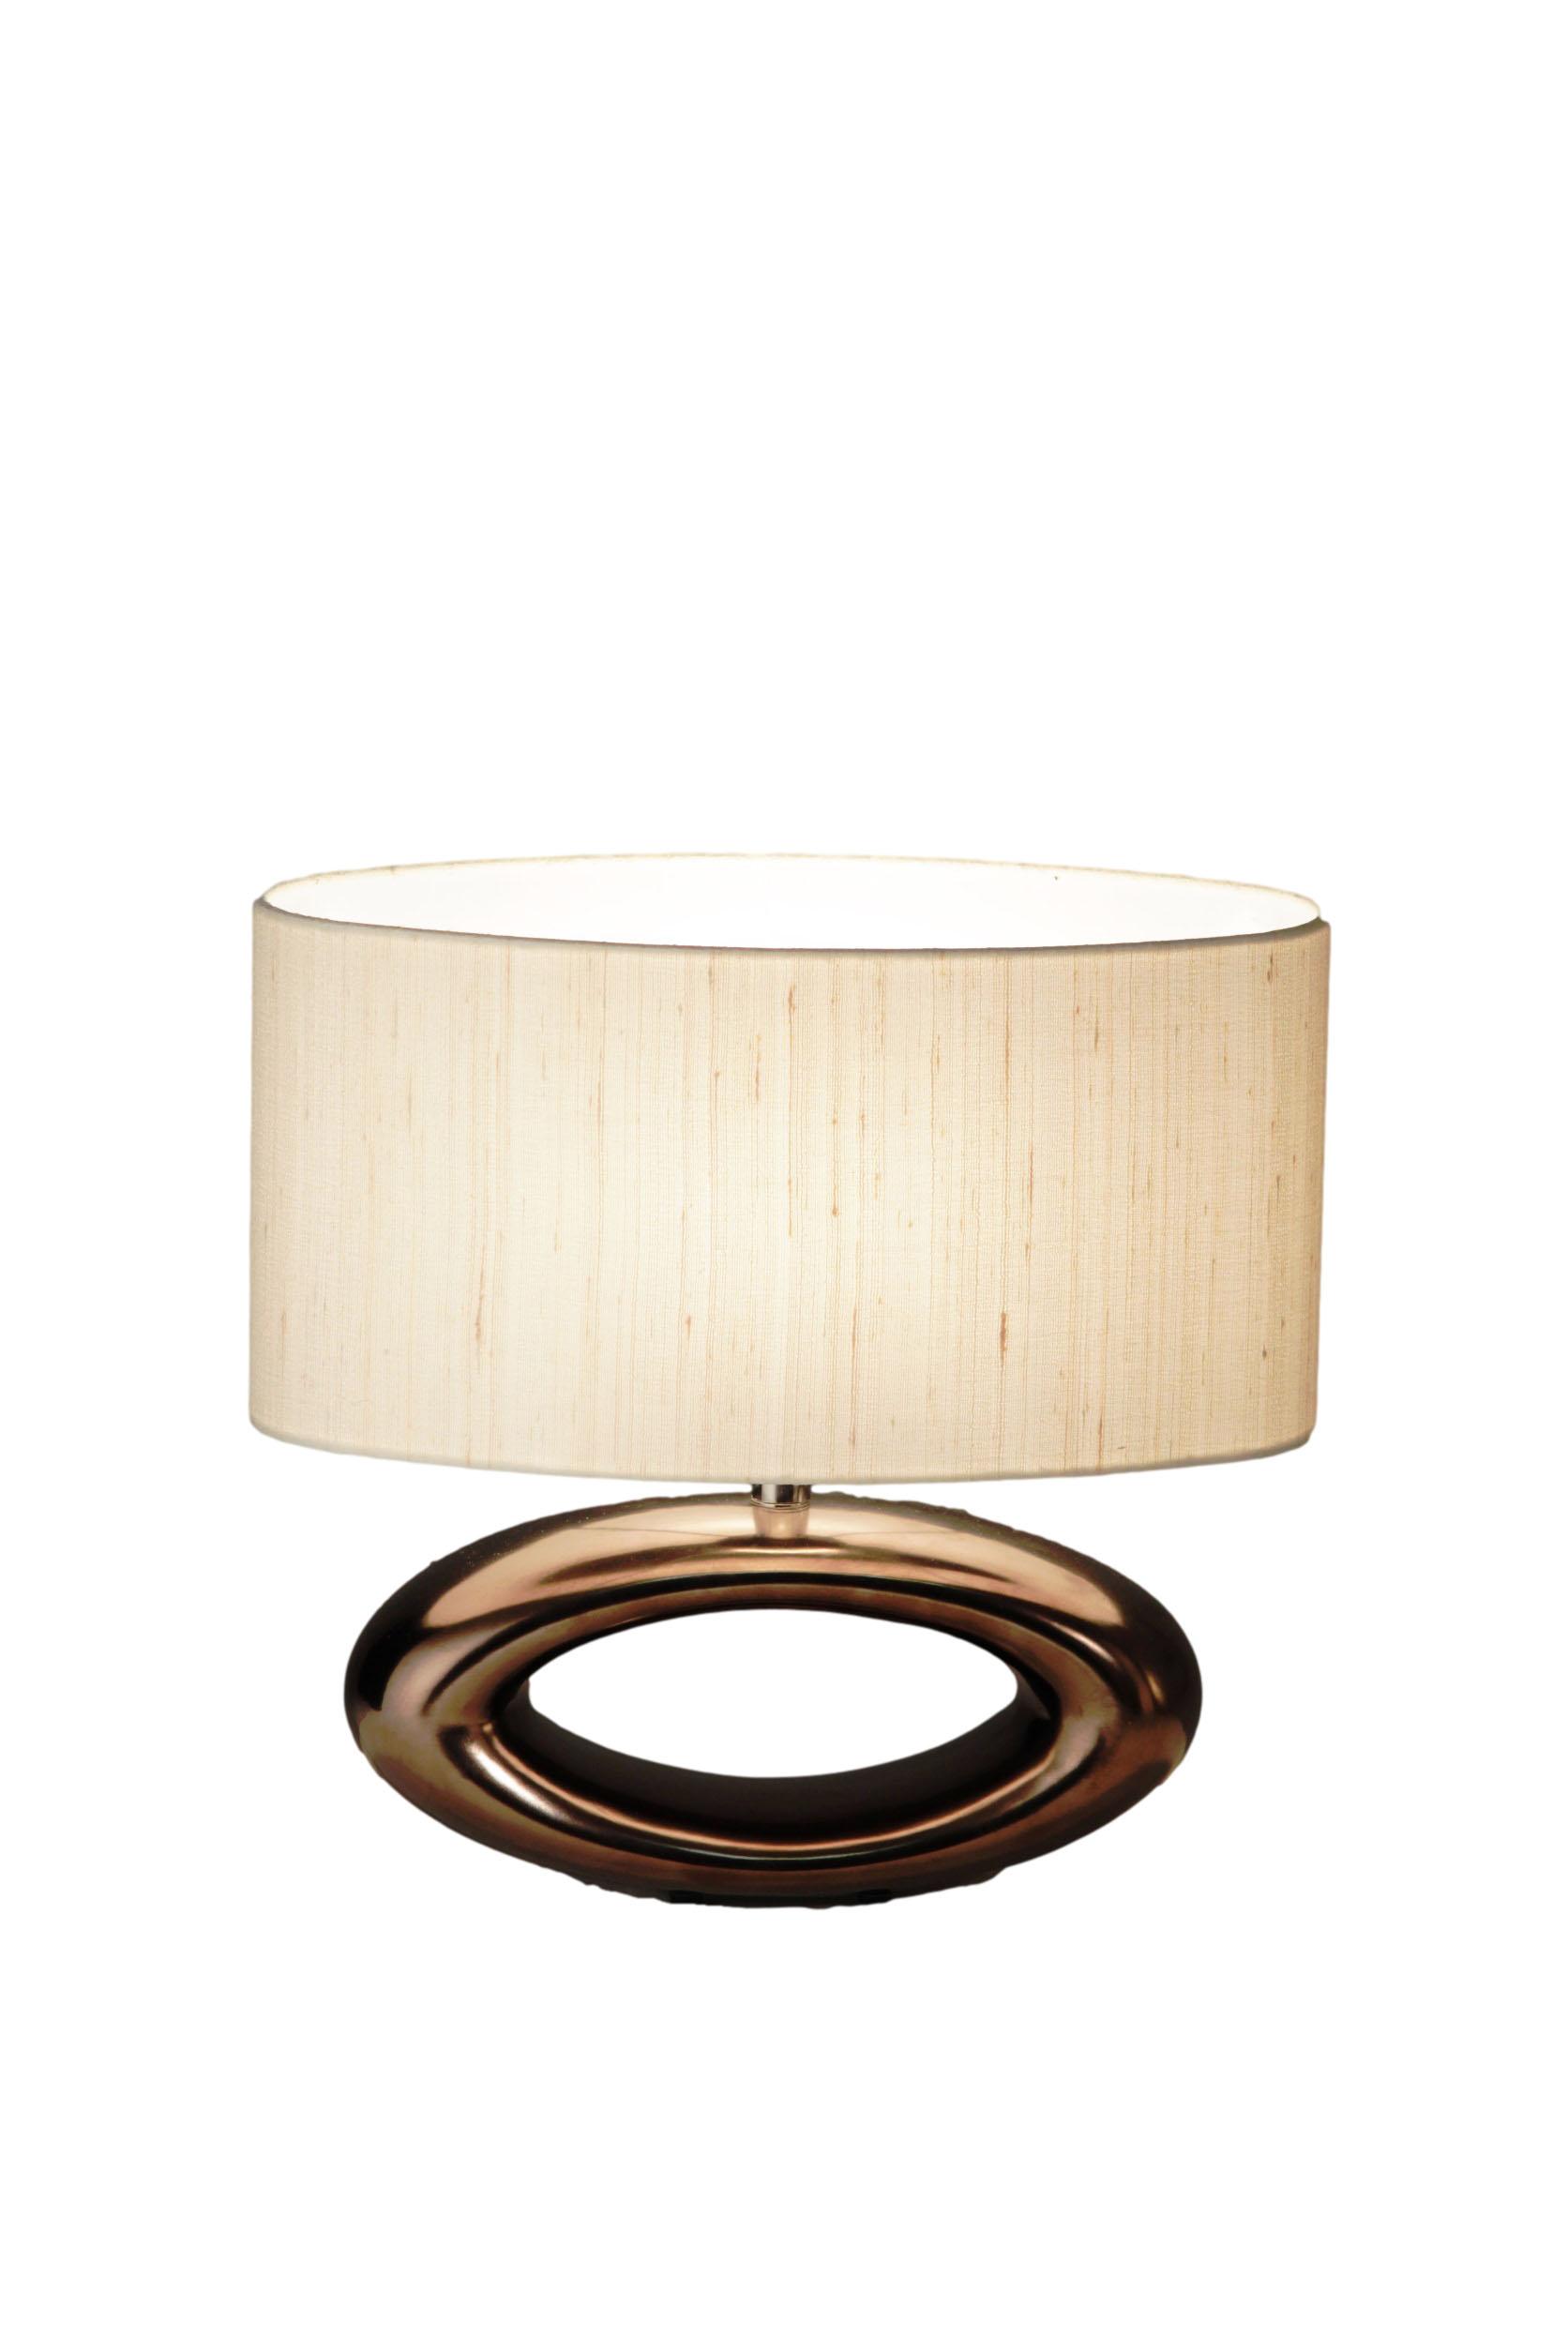 Stout Verlichting Collectie Sfeerfoto Tafellamp Daytona